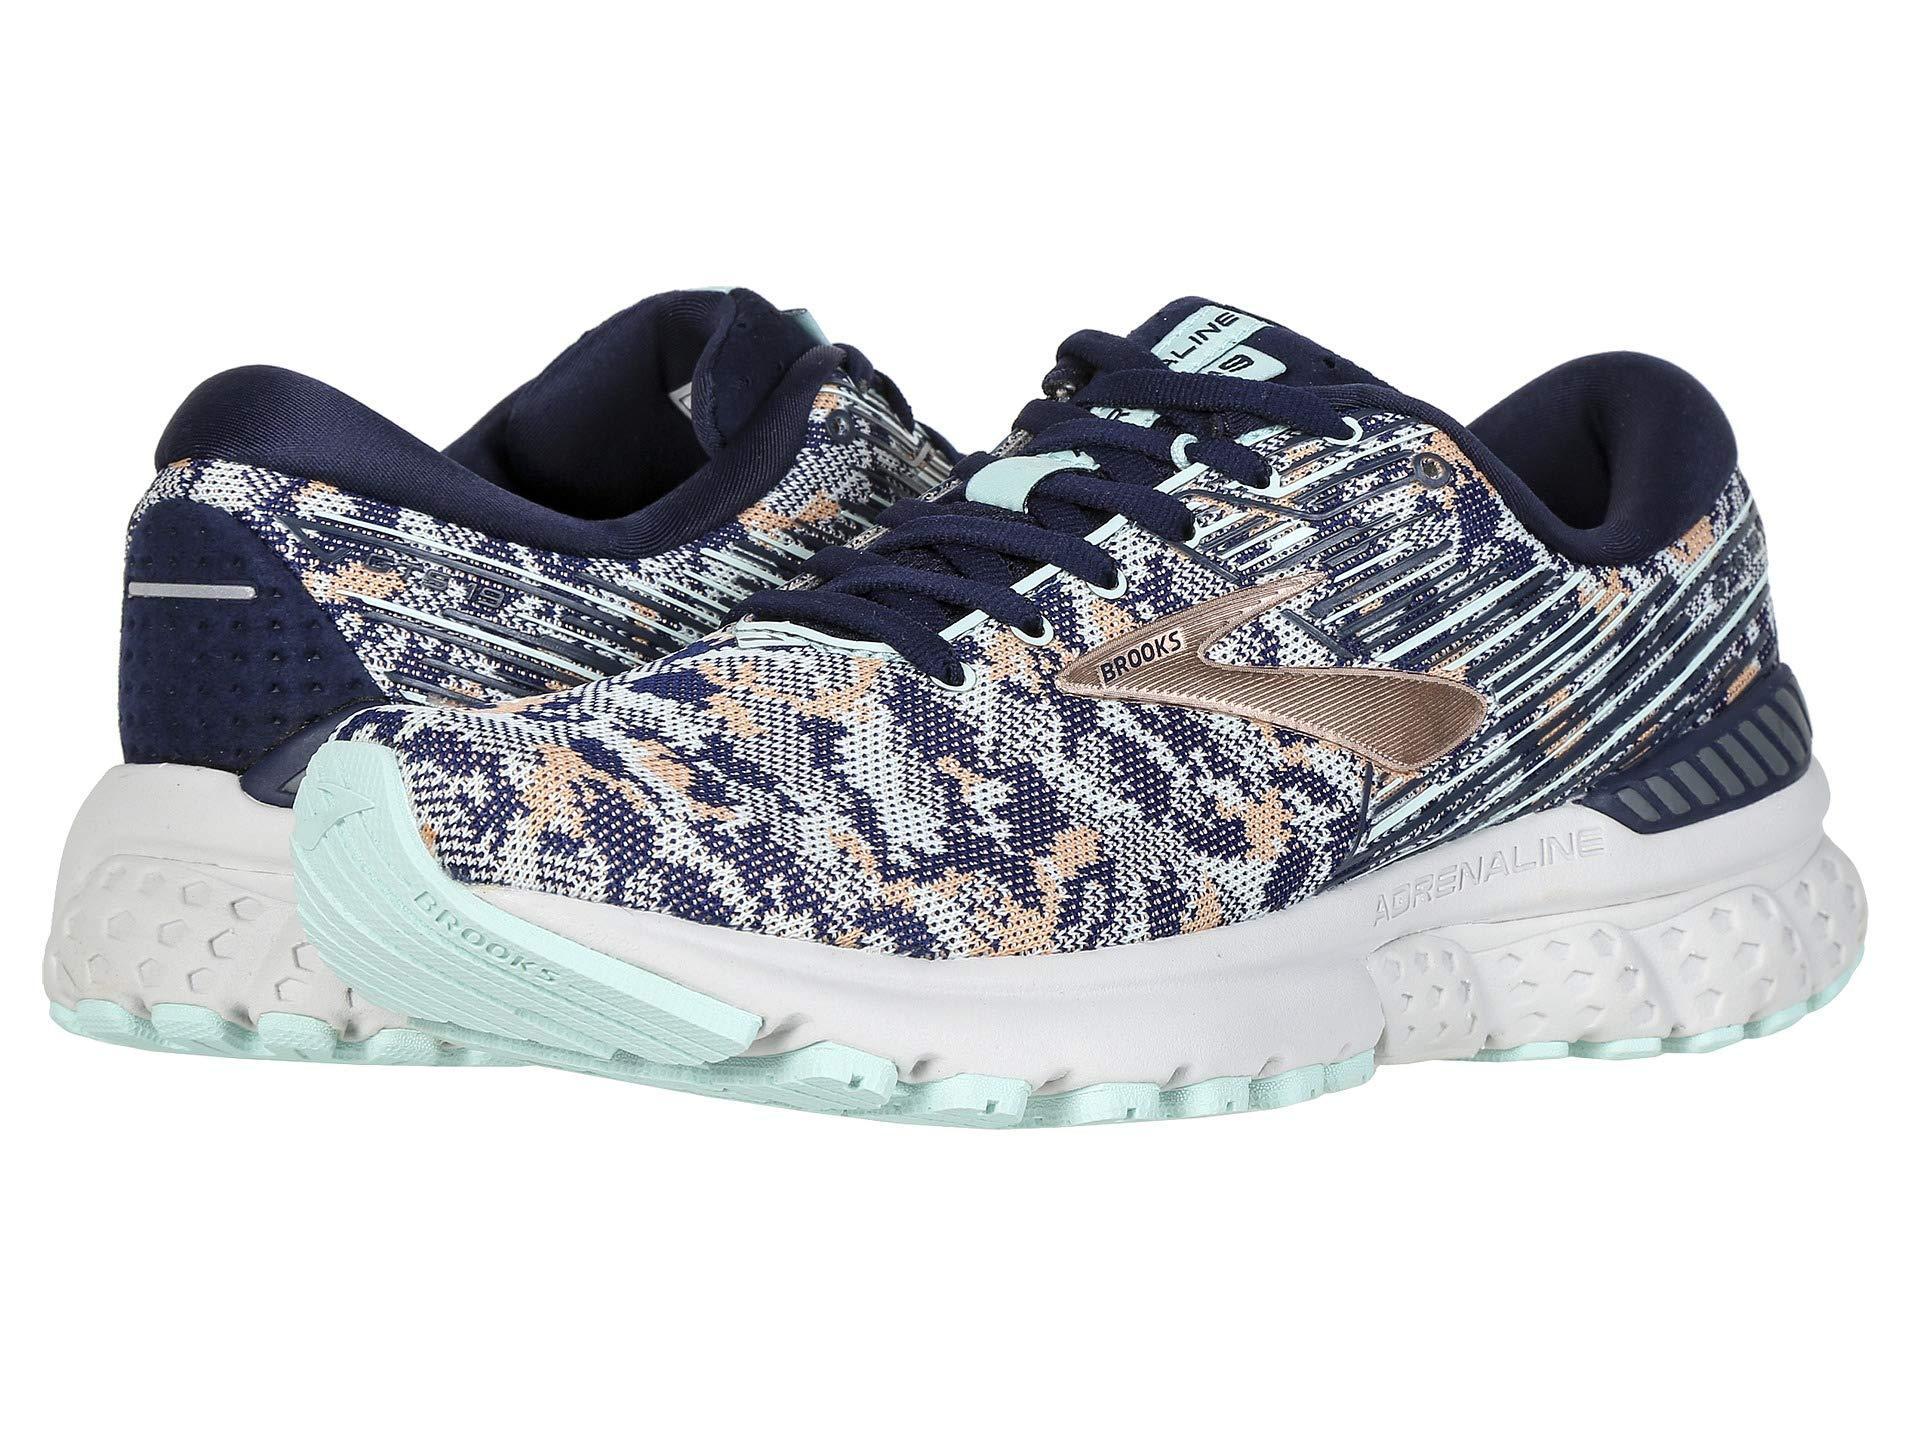 aa834c88945 Brooks - Blue Adrenaline Gts 19 (black purple coral) Women s Running Shoes.  View fullscreen